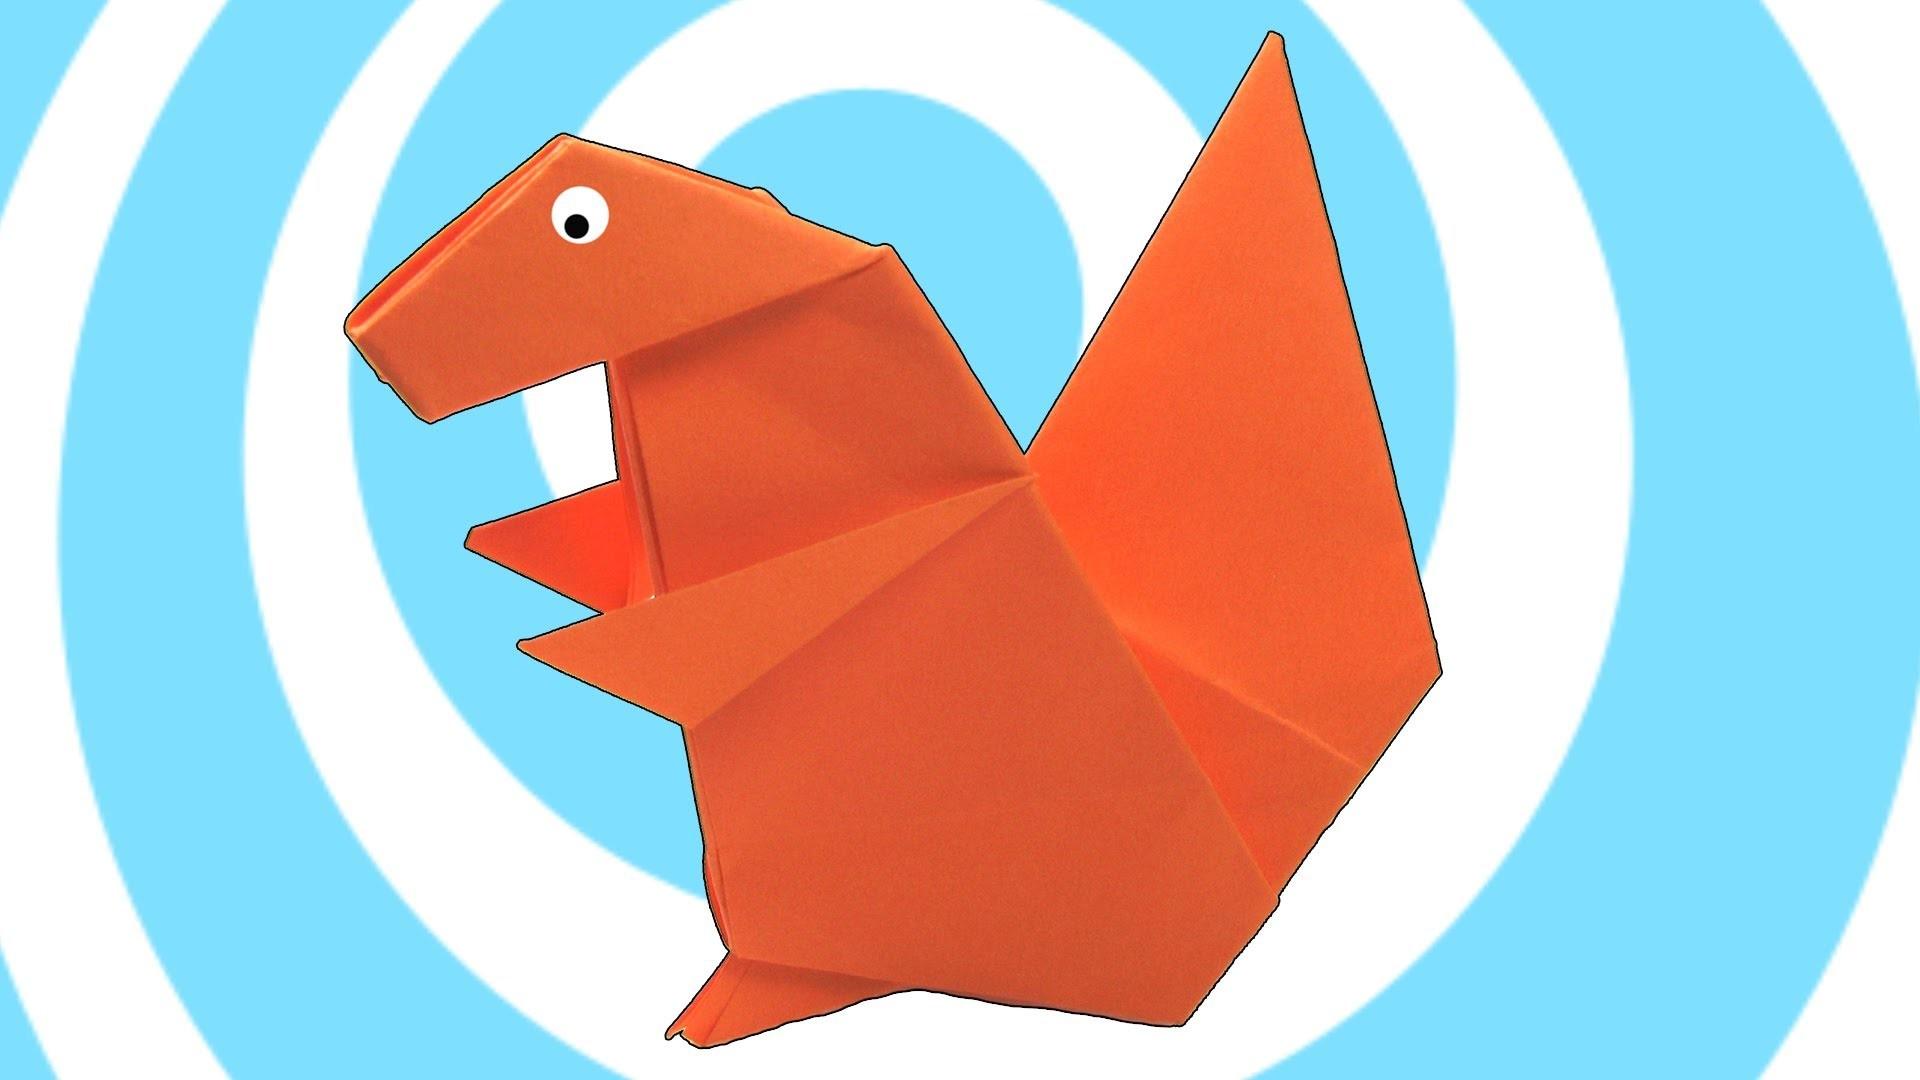 Paper Origami Squirrel Instructions